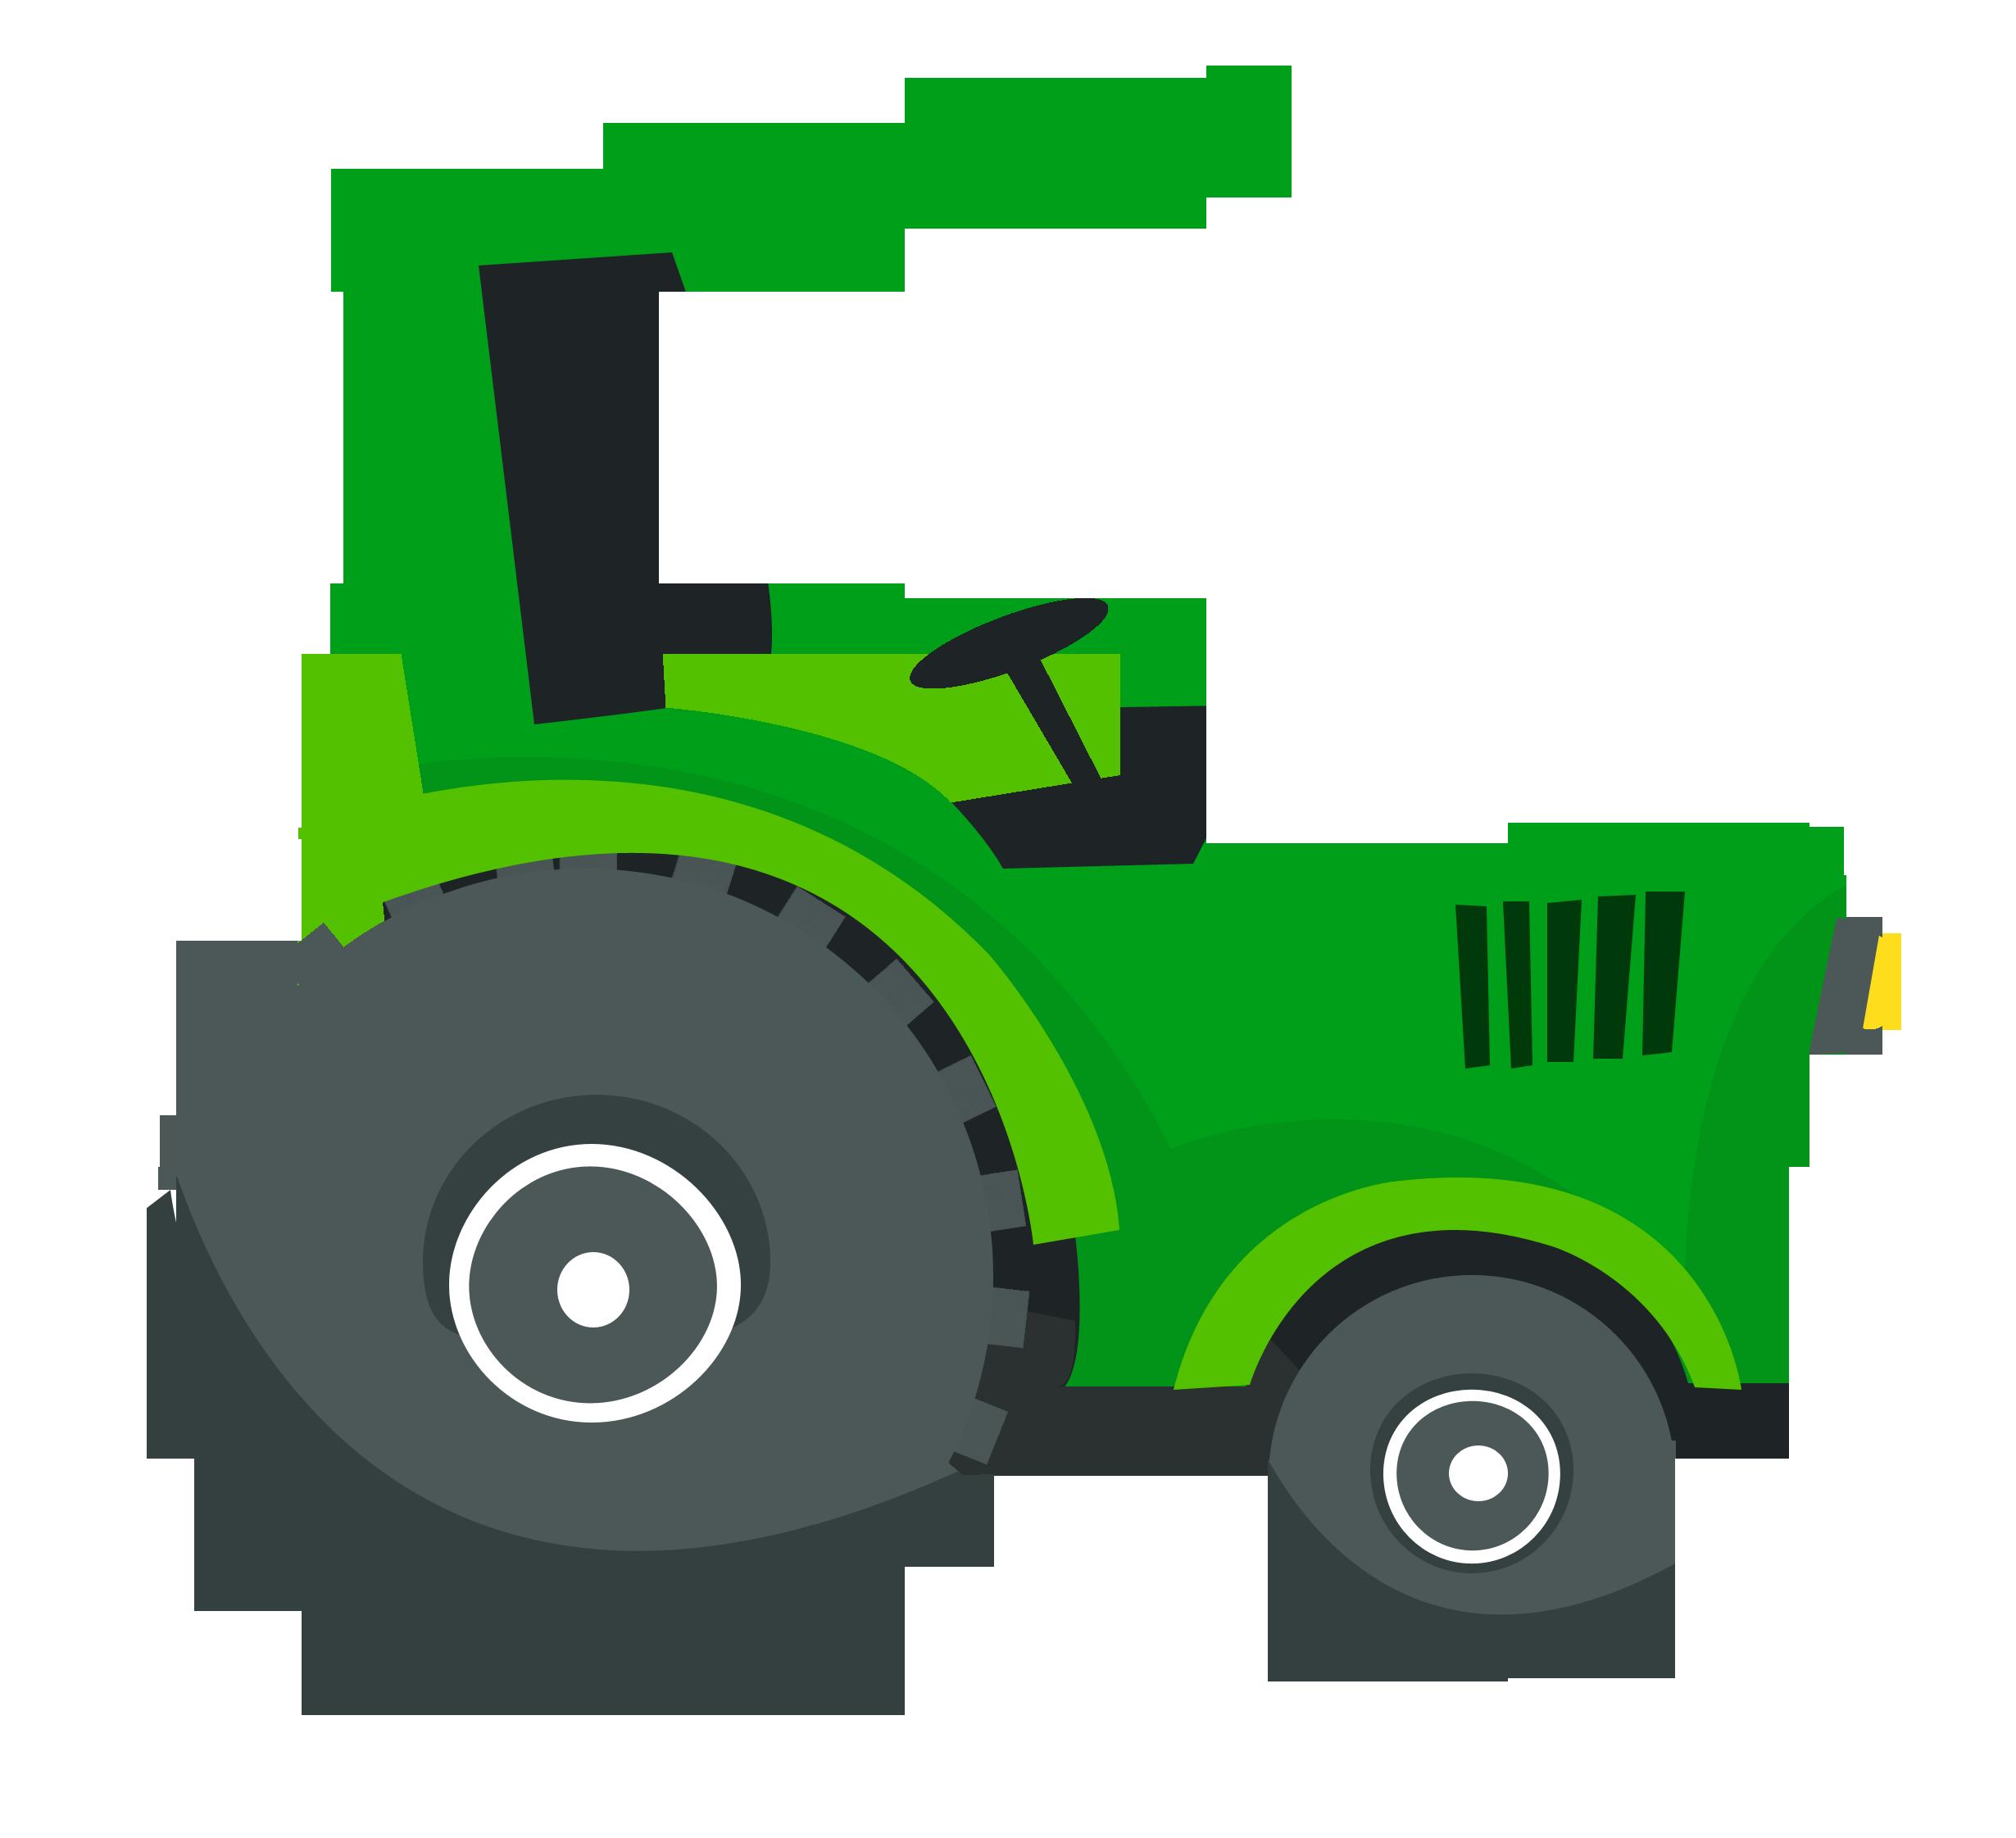 Wheel clipart tractor wheel. Fazenda cat on the